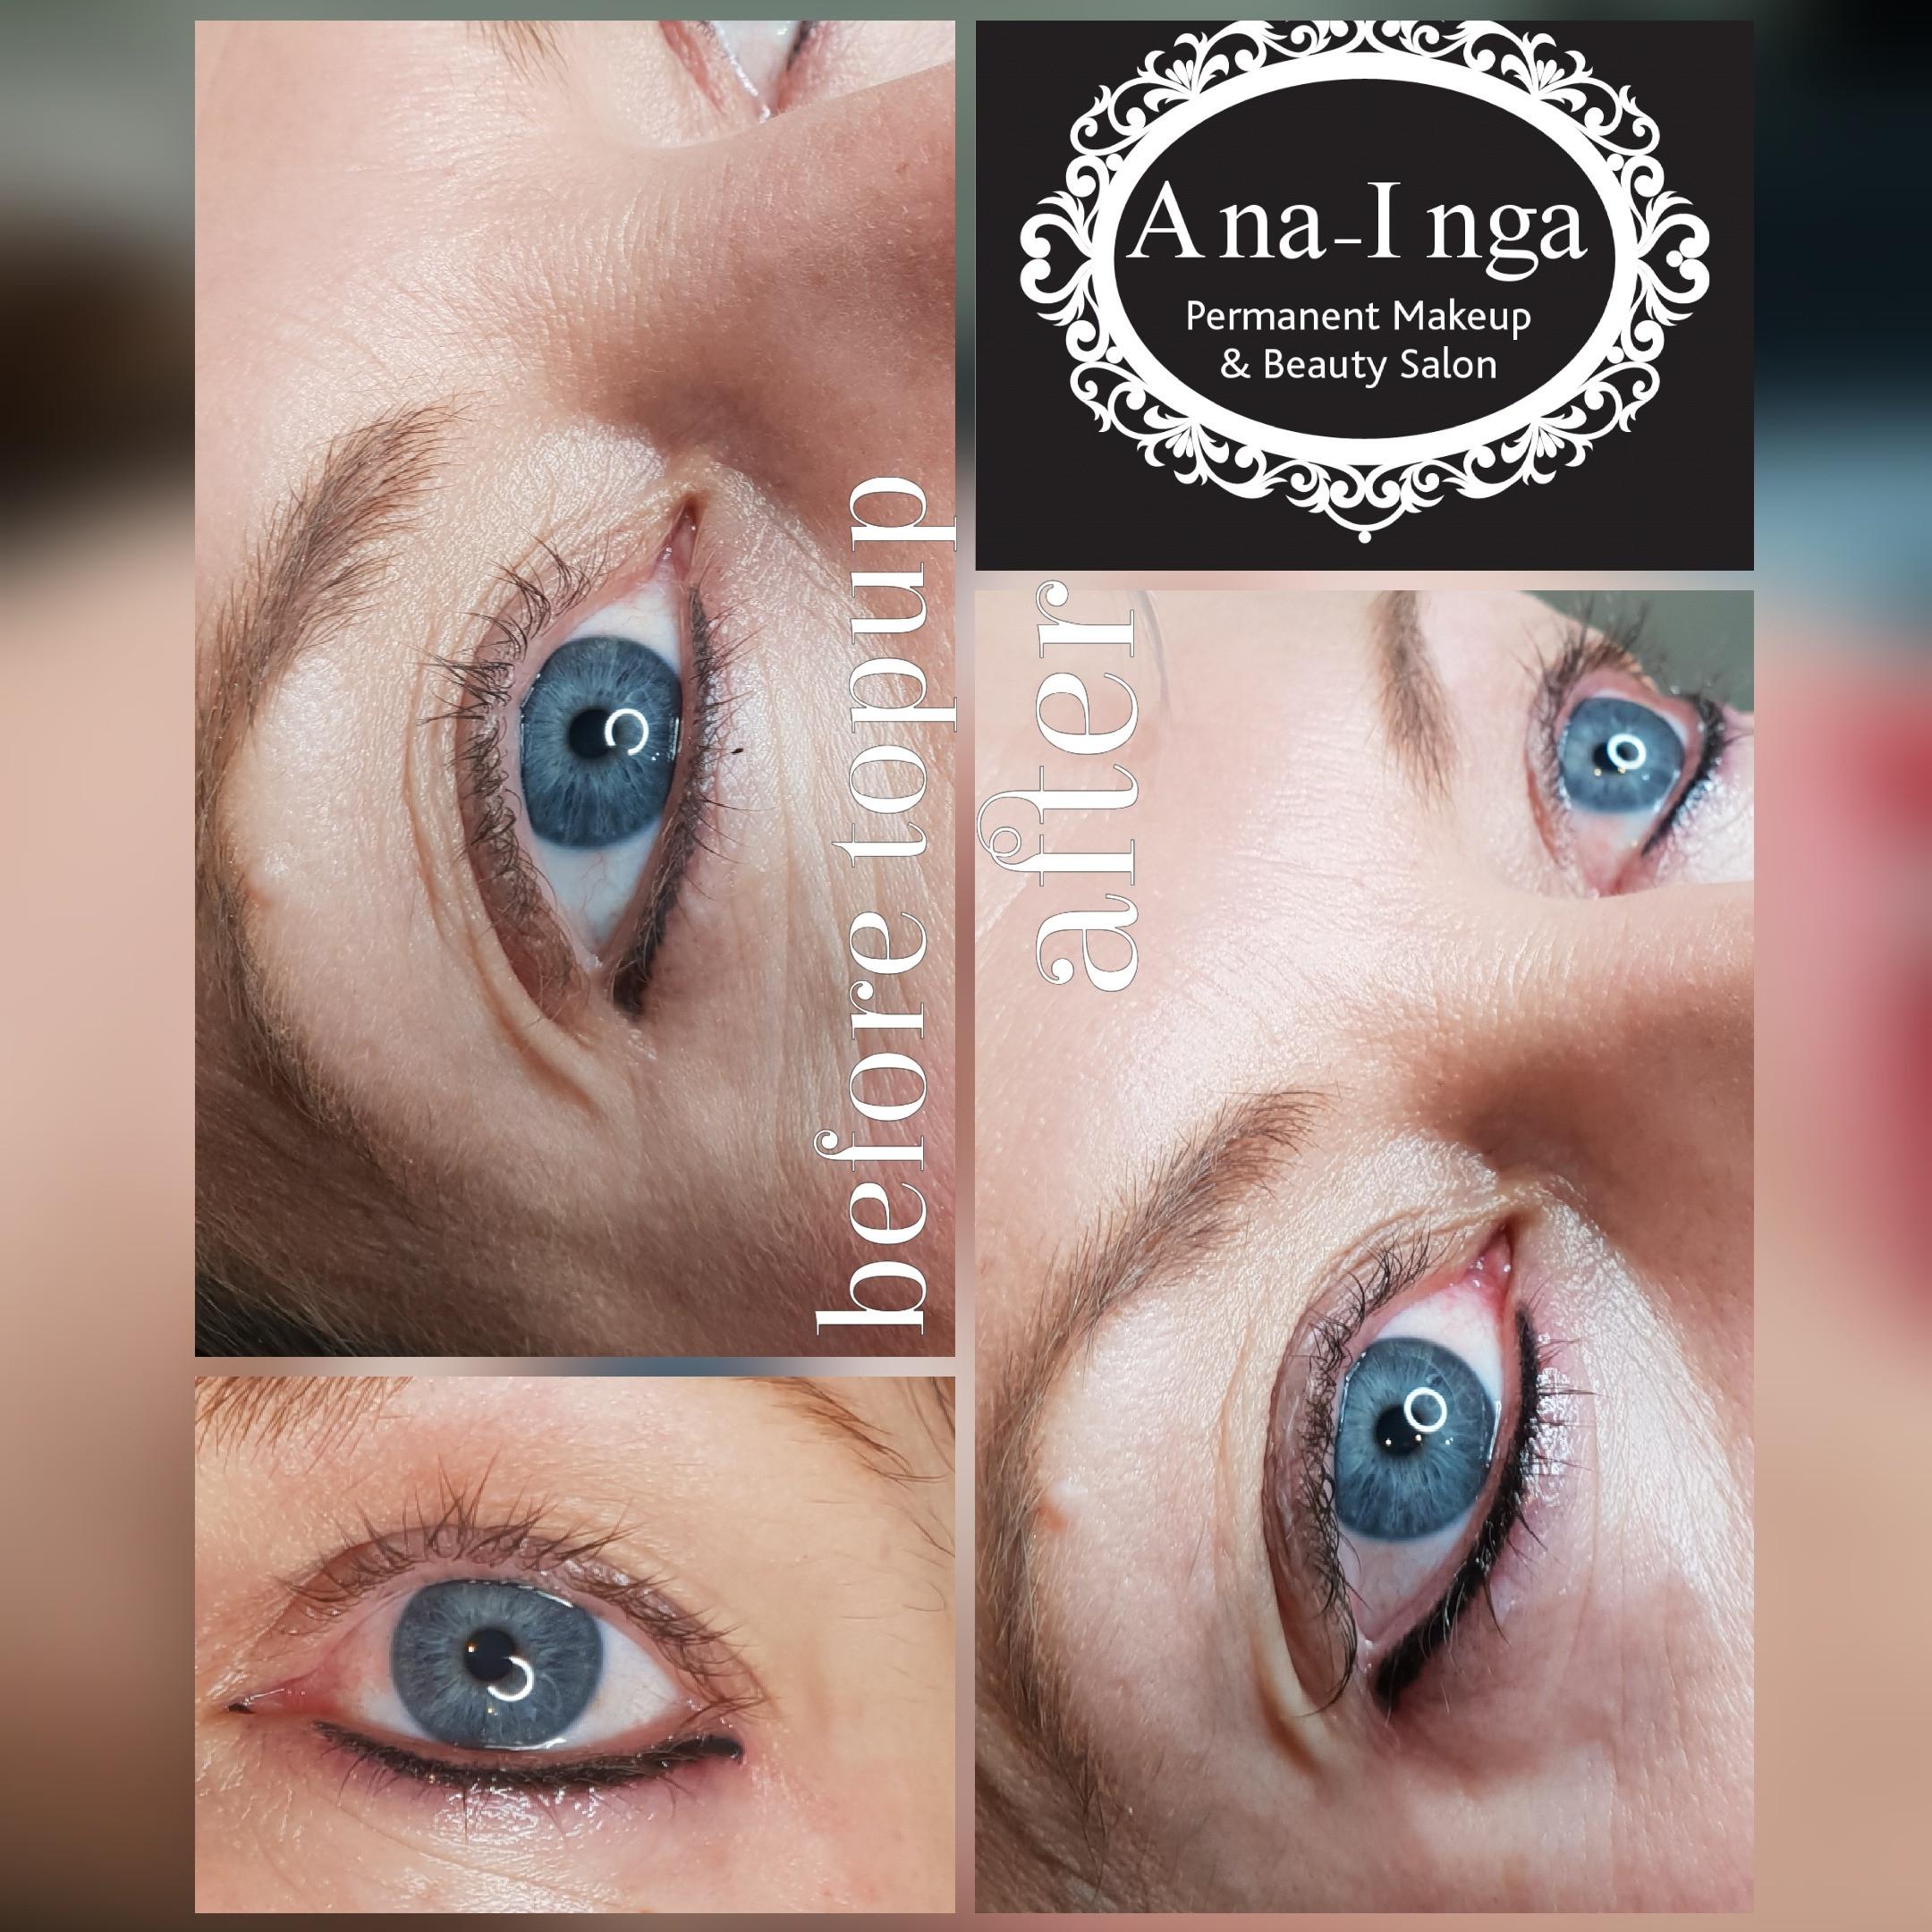 Lower lash eyeliner